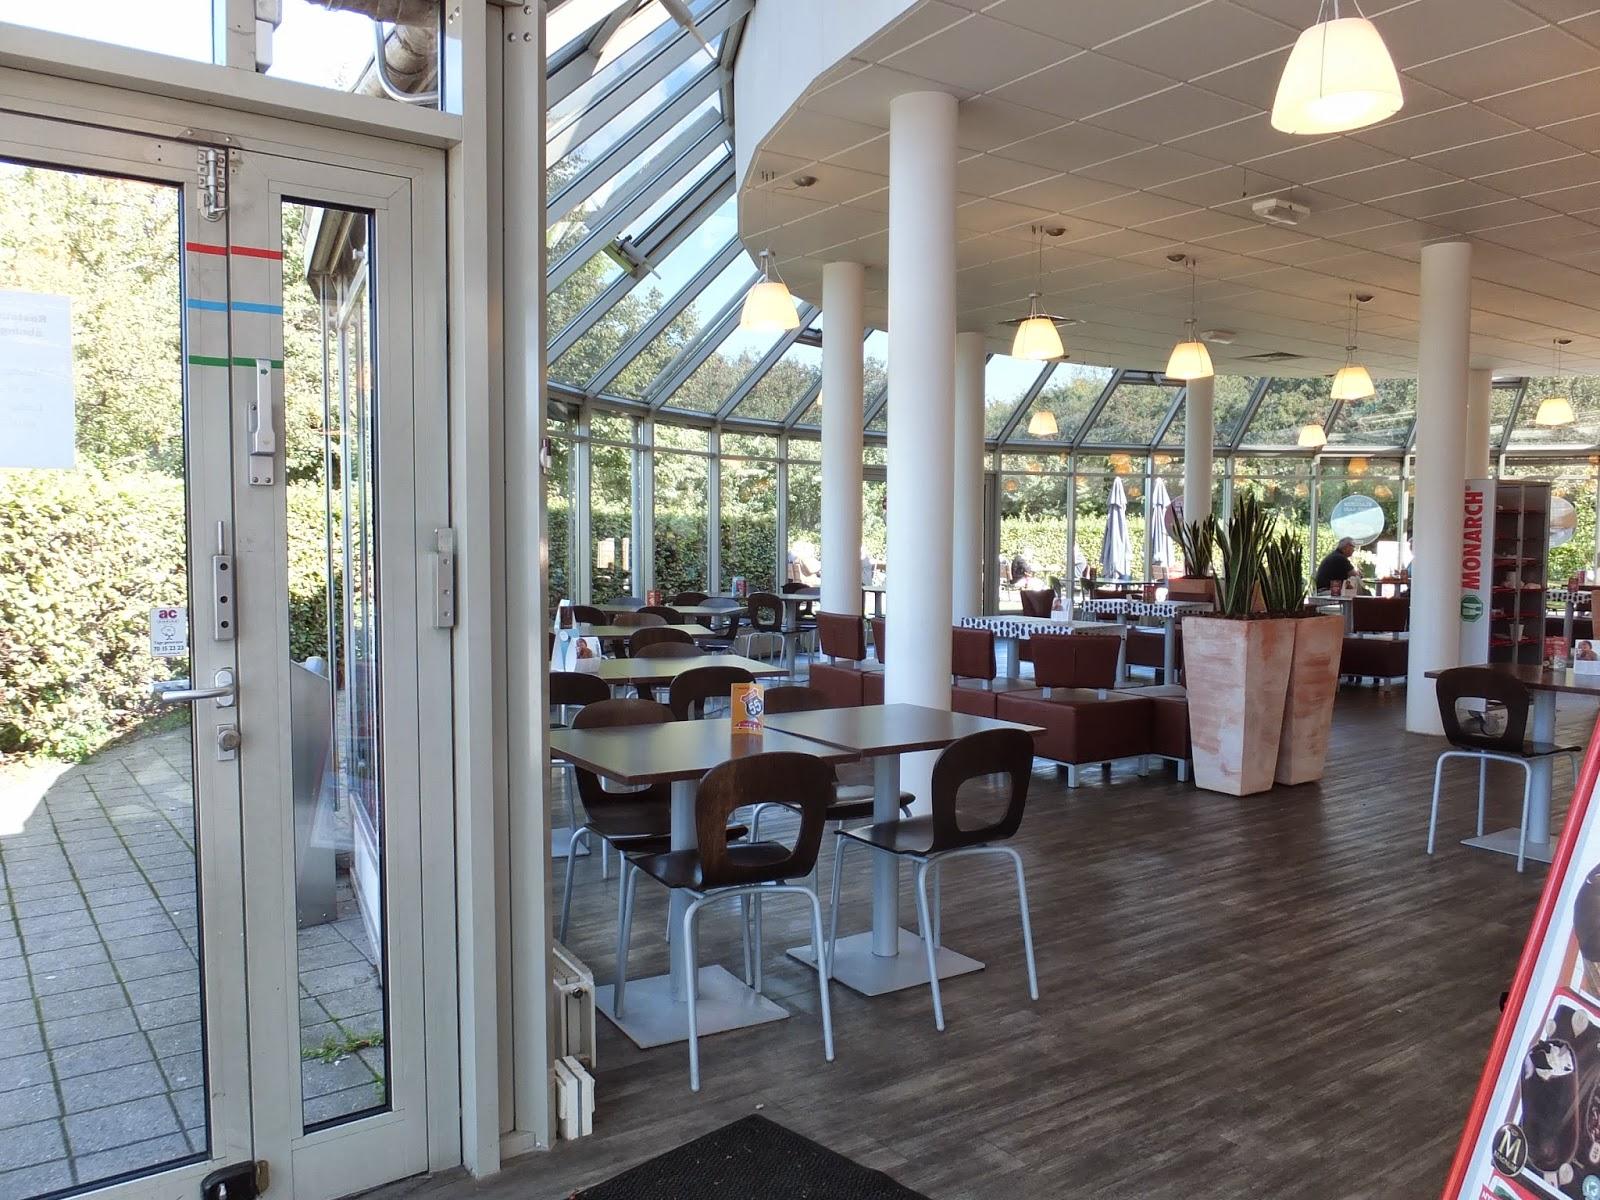 rest-area-denmark-restaurant デンマークのサービスエリアレストラン